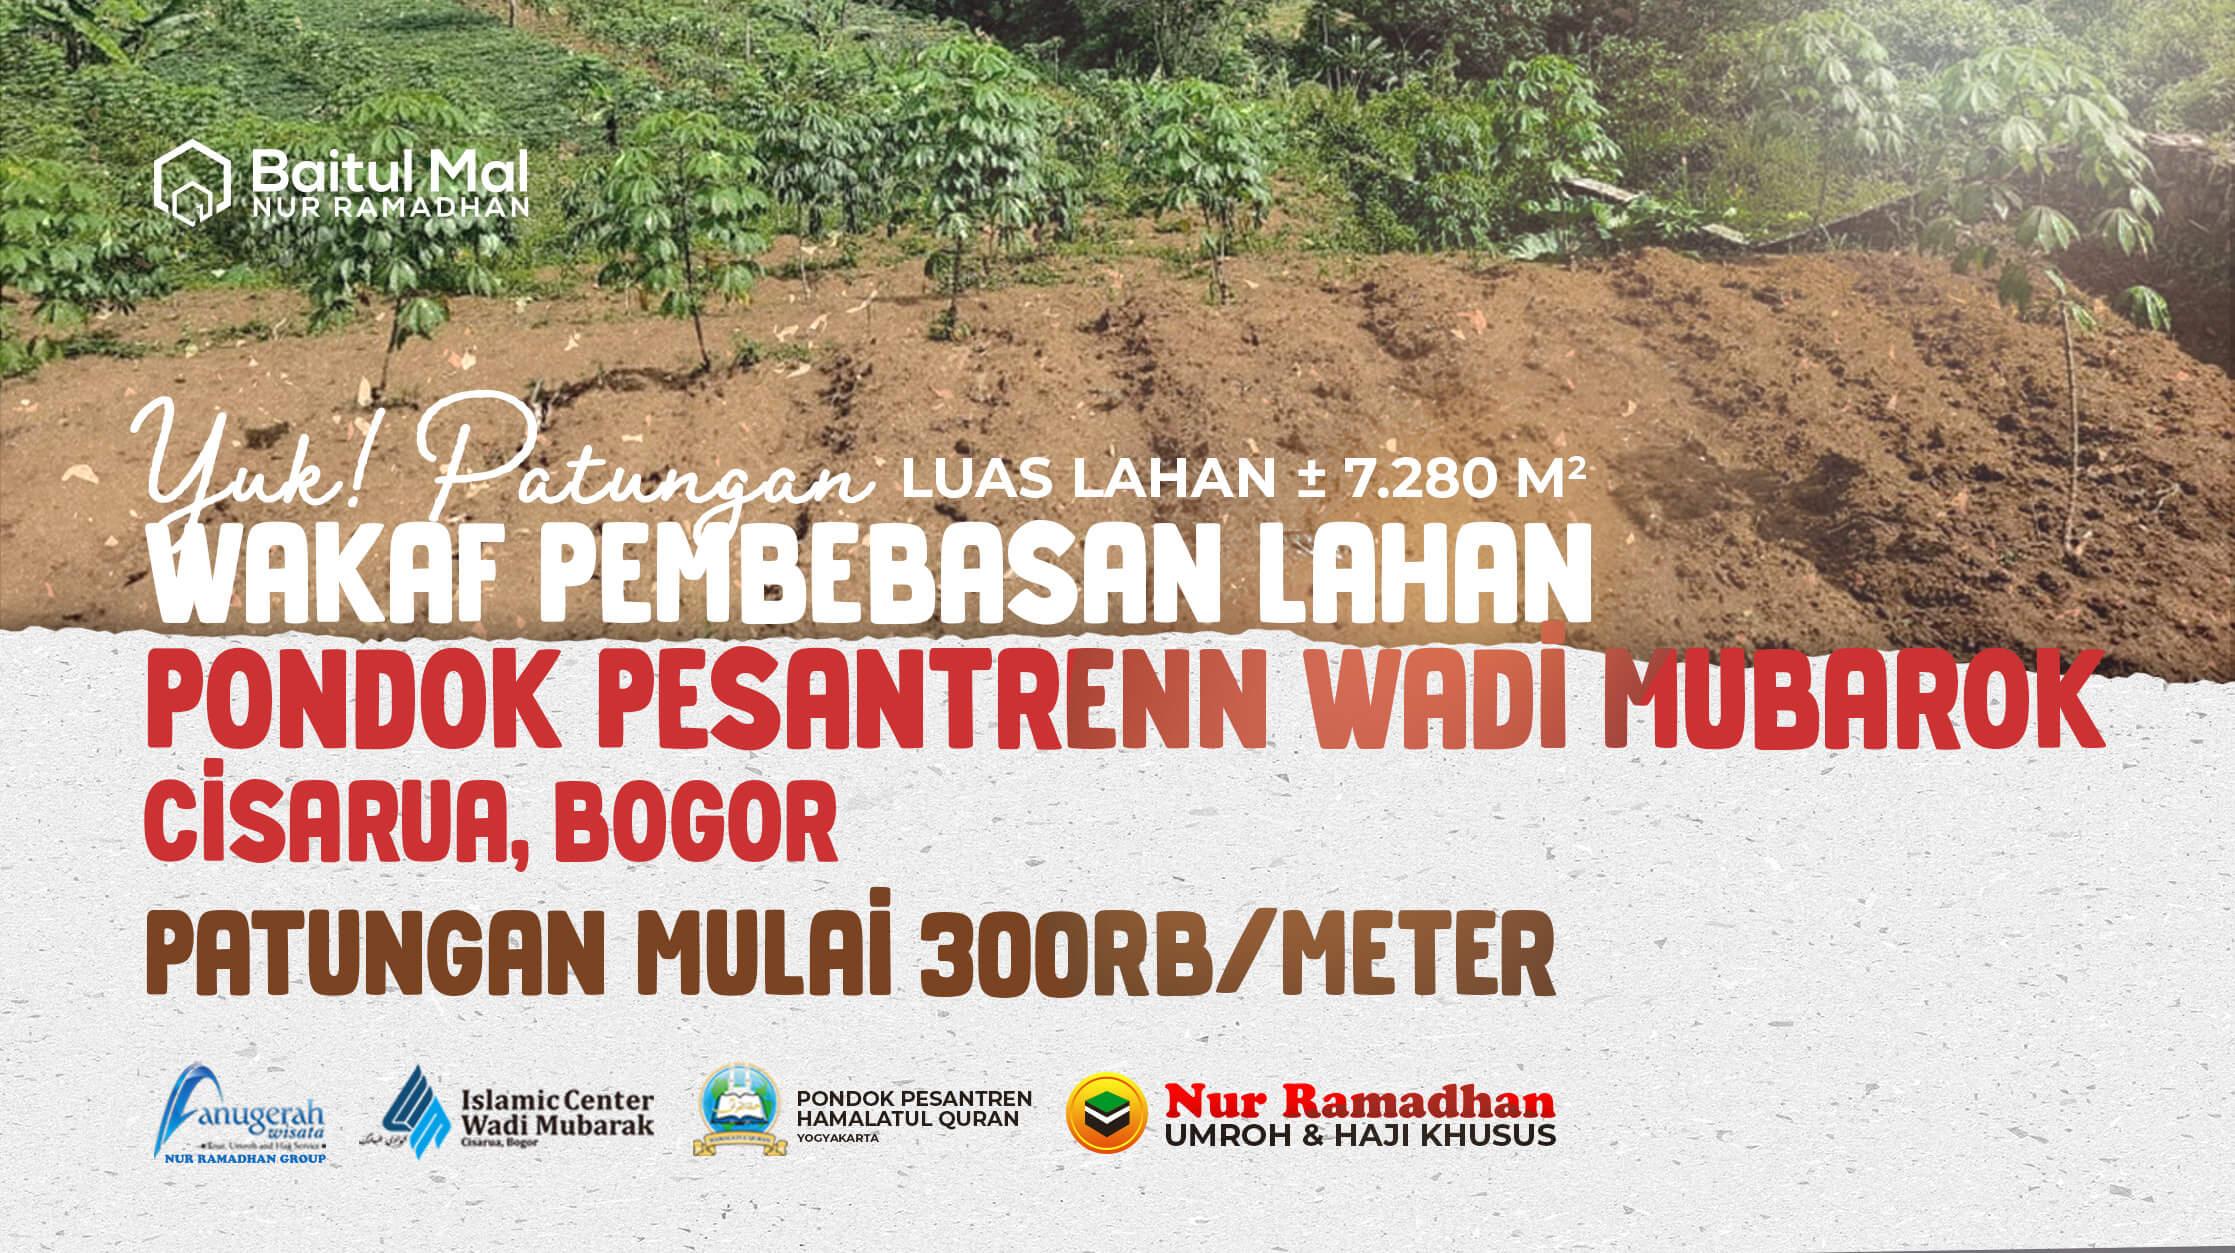 WAKAF PEMBEBASAN LAHAN WADI MUBAROK, Baitul Mal Nur Ramadhan